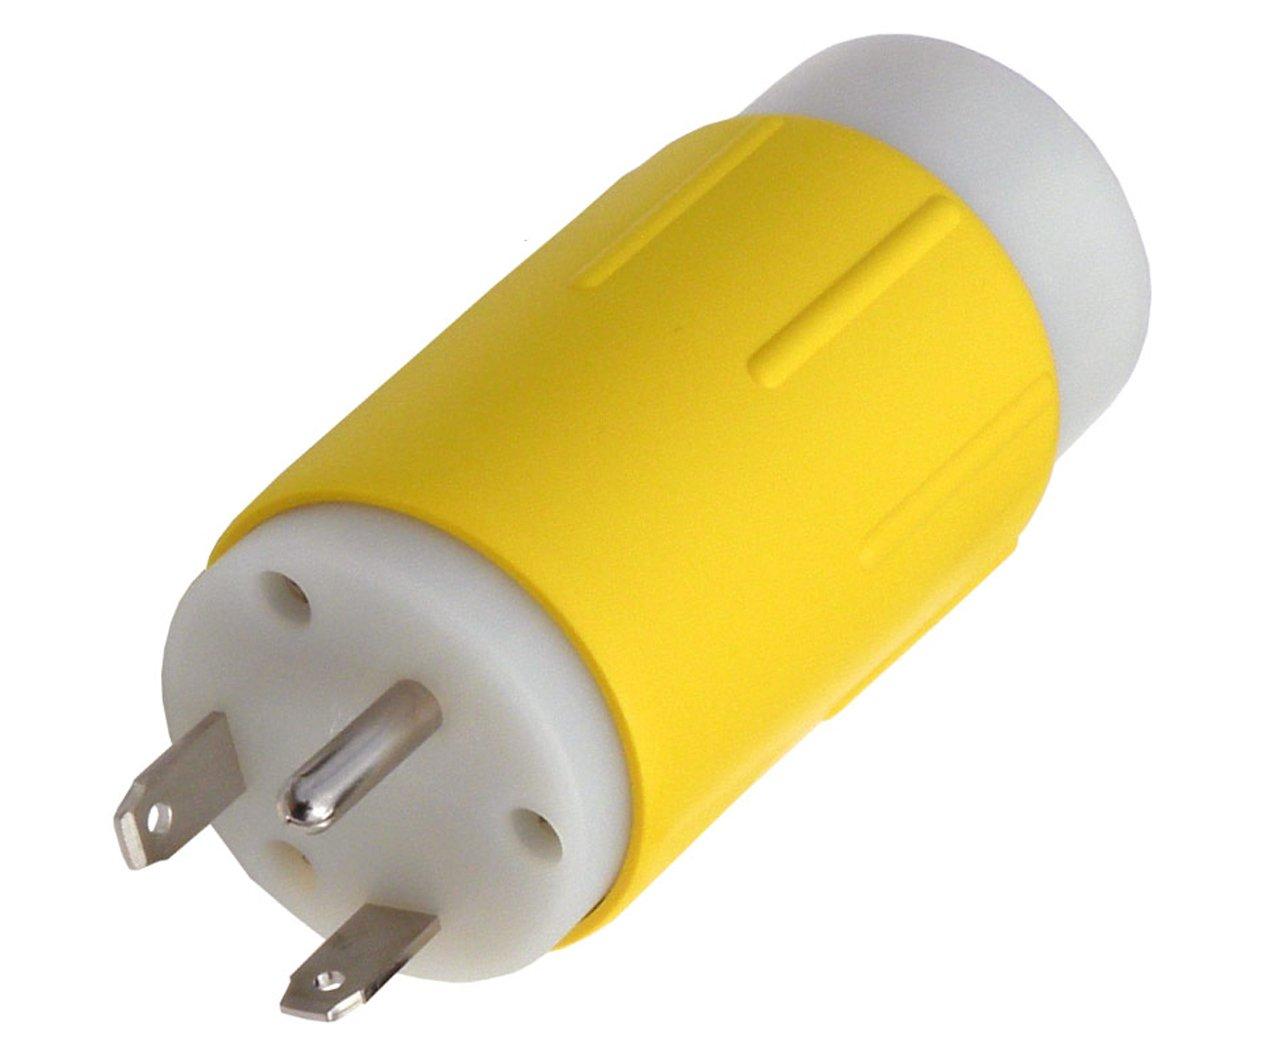 Canavis Rl14109 Rv 30 Amp Plug Tt 30p 14 50r 50 125 Electrical Receptacle 3 Wire 20 Amps 250v Nema 6 20r Yga022f Ebay Adapter Automotive